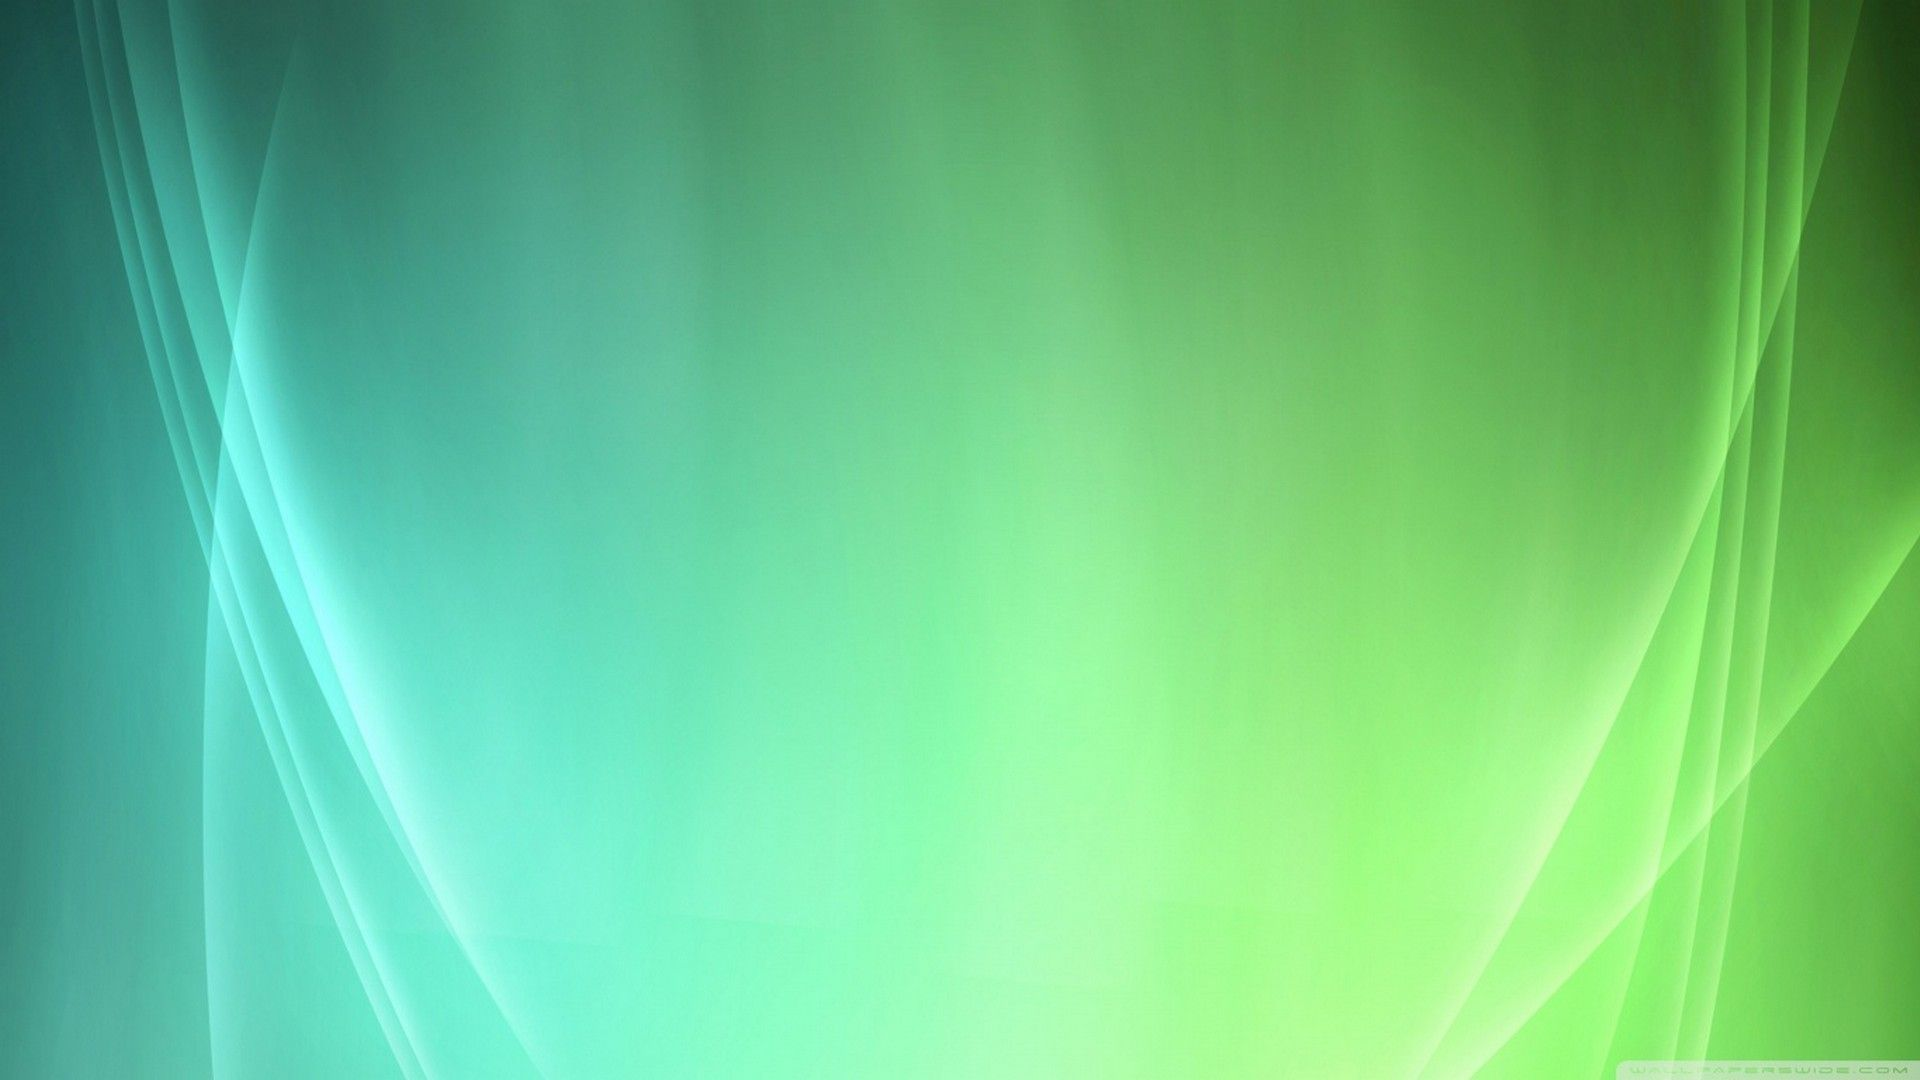 Neon Green wallpaper picture hd